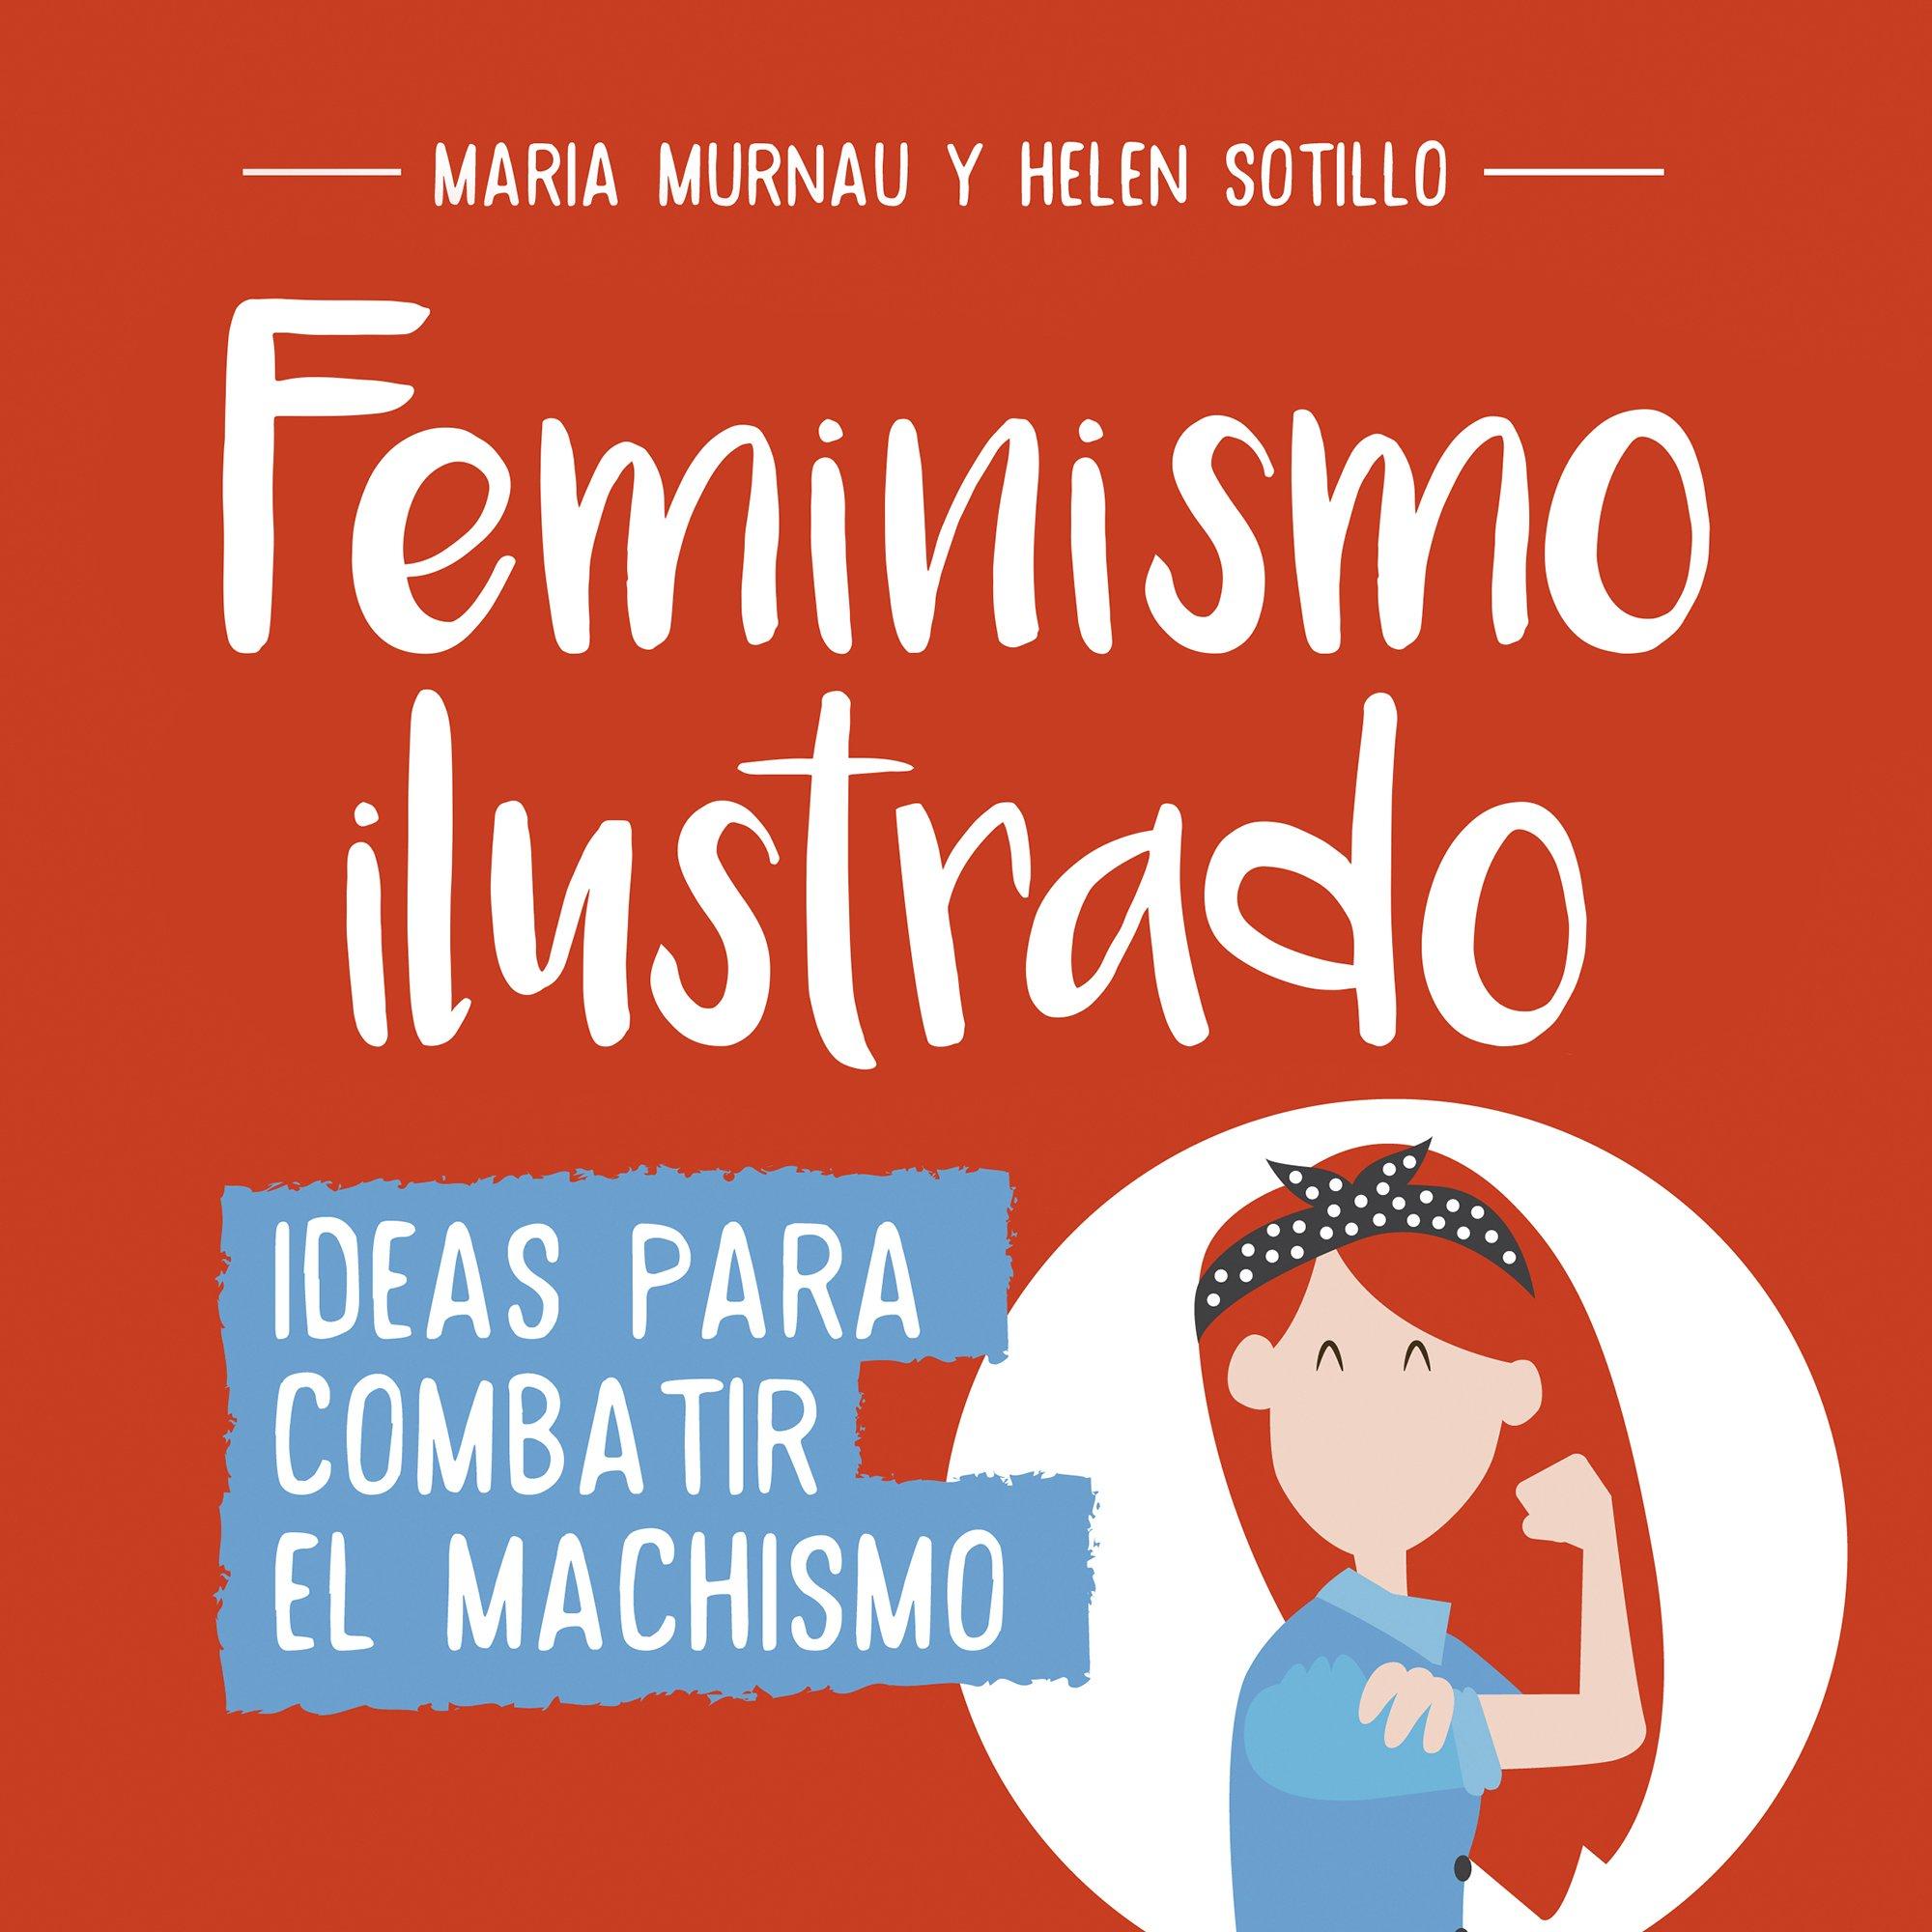 Resultado de imagen de feminismo ilustrado maria murnau